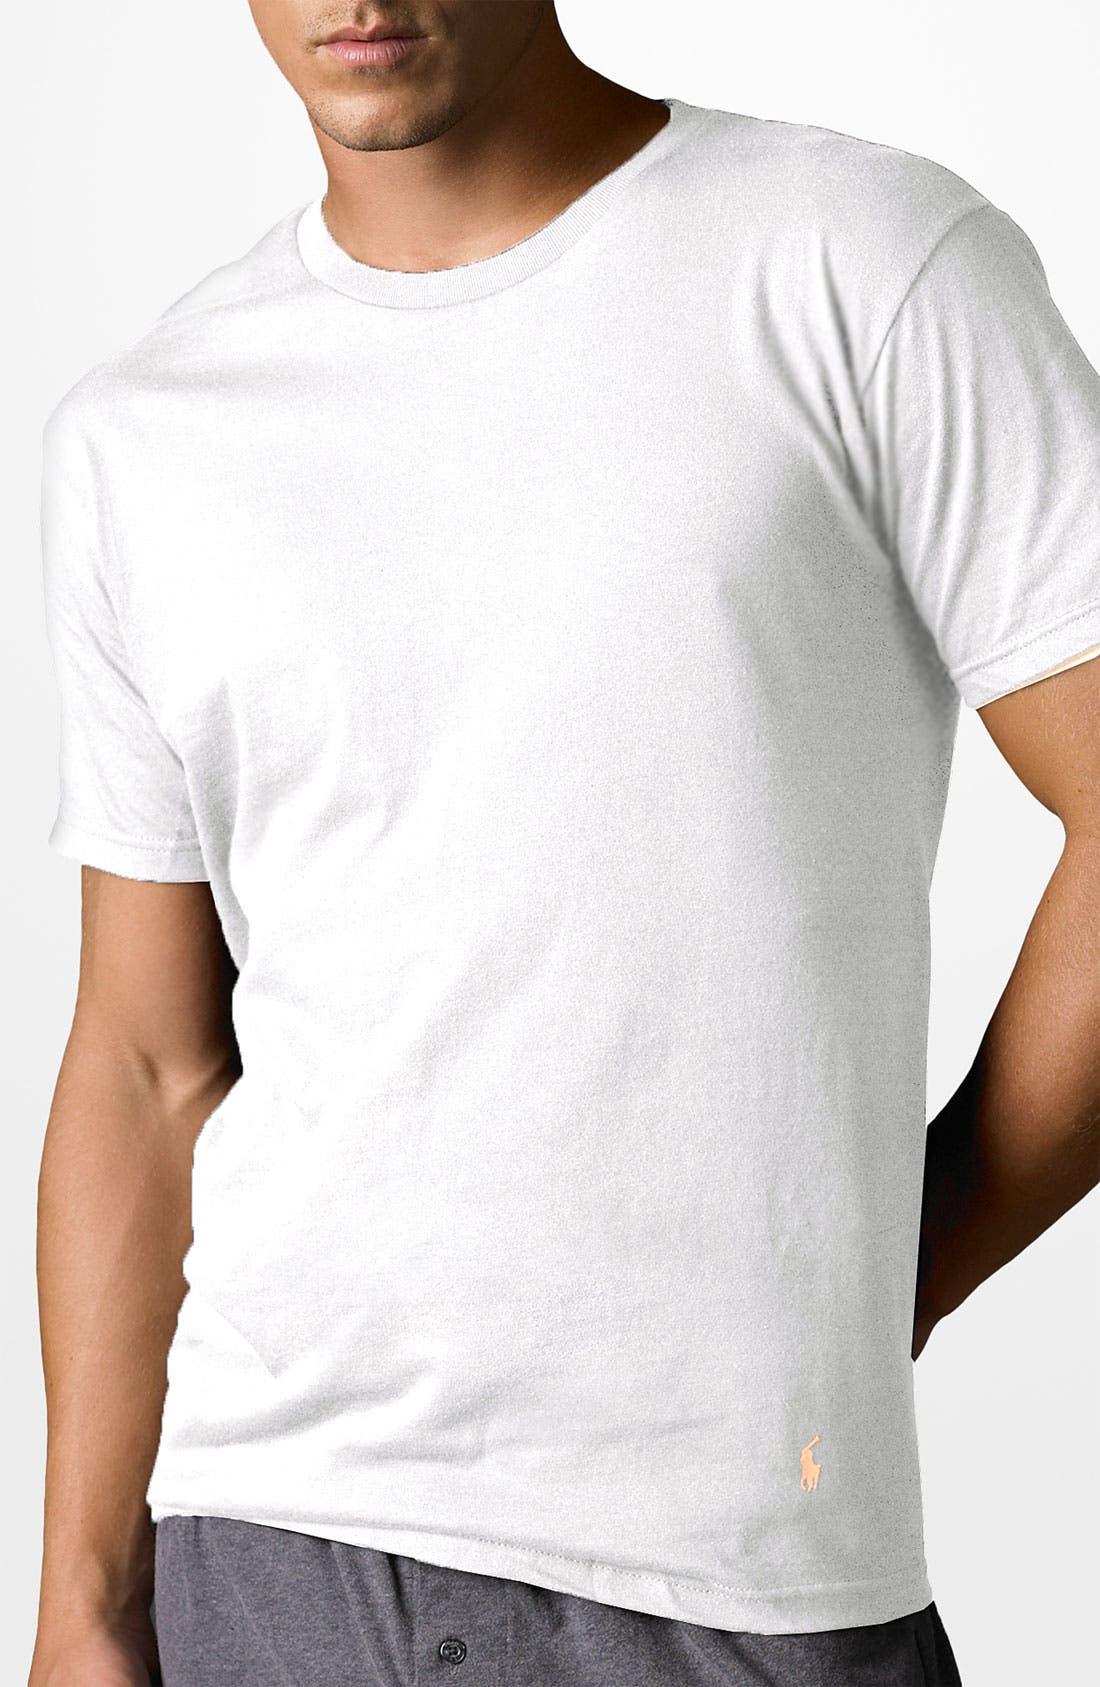 Alternate Image 1 Selected - Polo Ralph Lauren Cotton Crewneck T-Shirt (3-Pack)